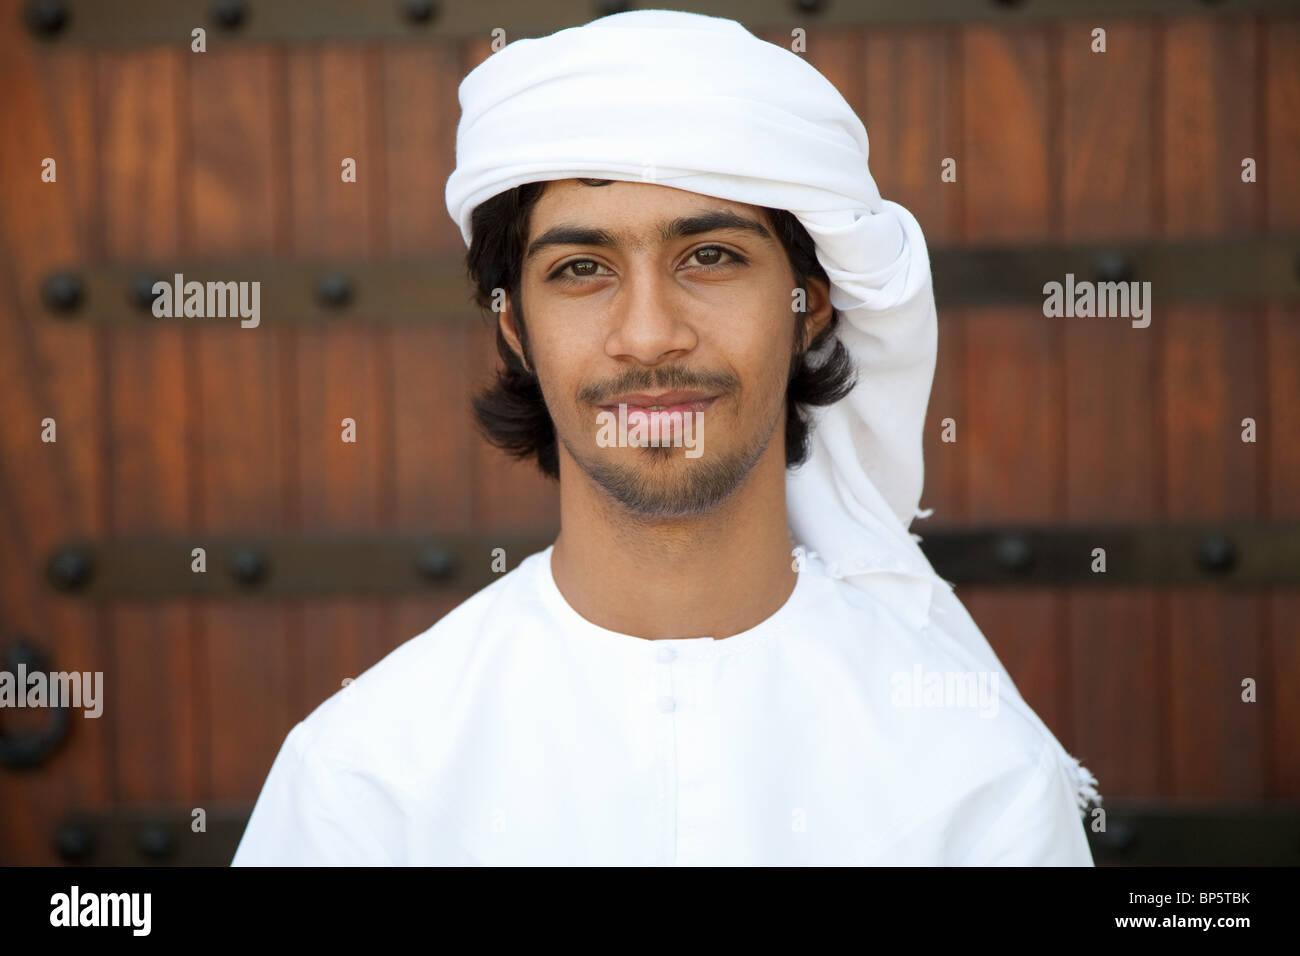 Nahen Ostens Mann tragen Kopfschmuck, portrait Stockbild